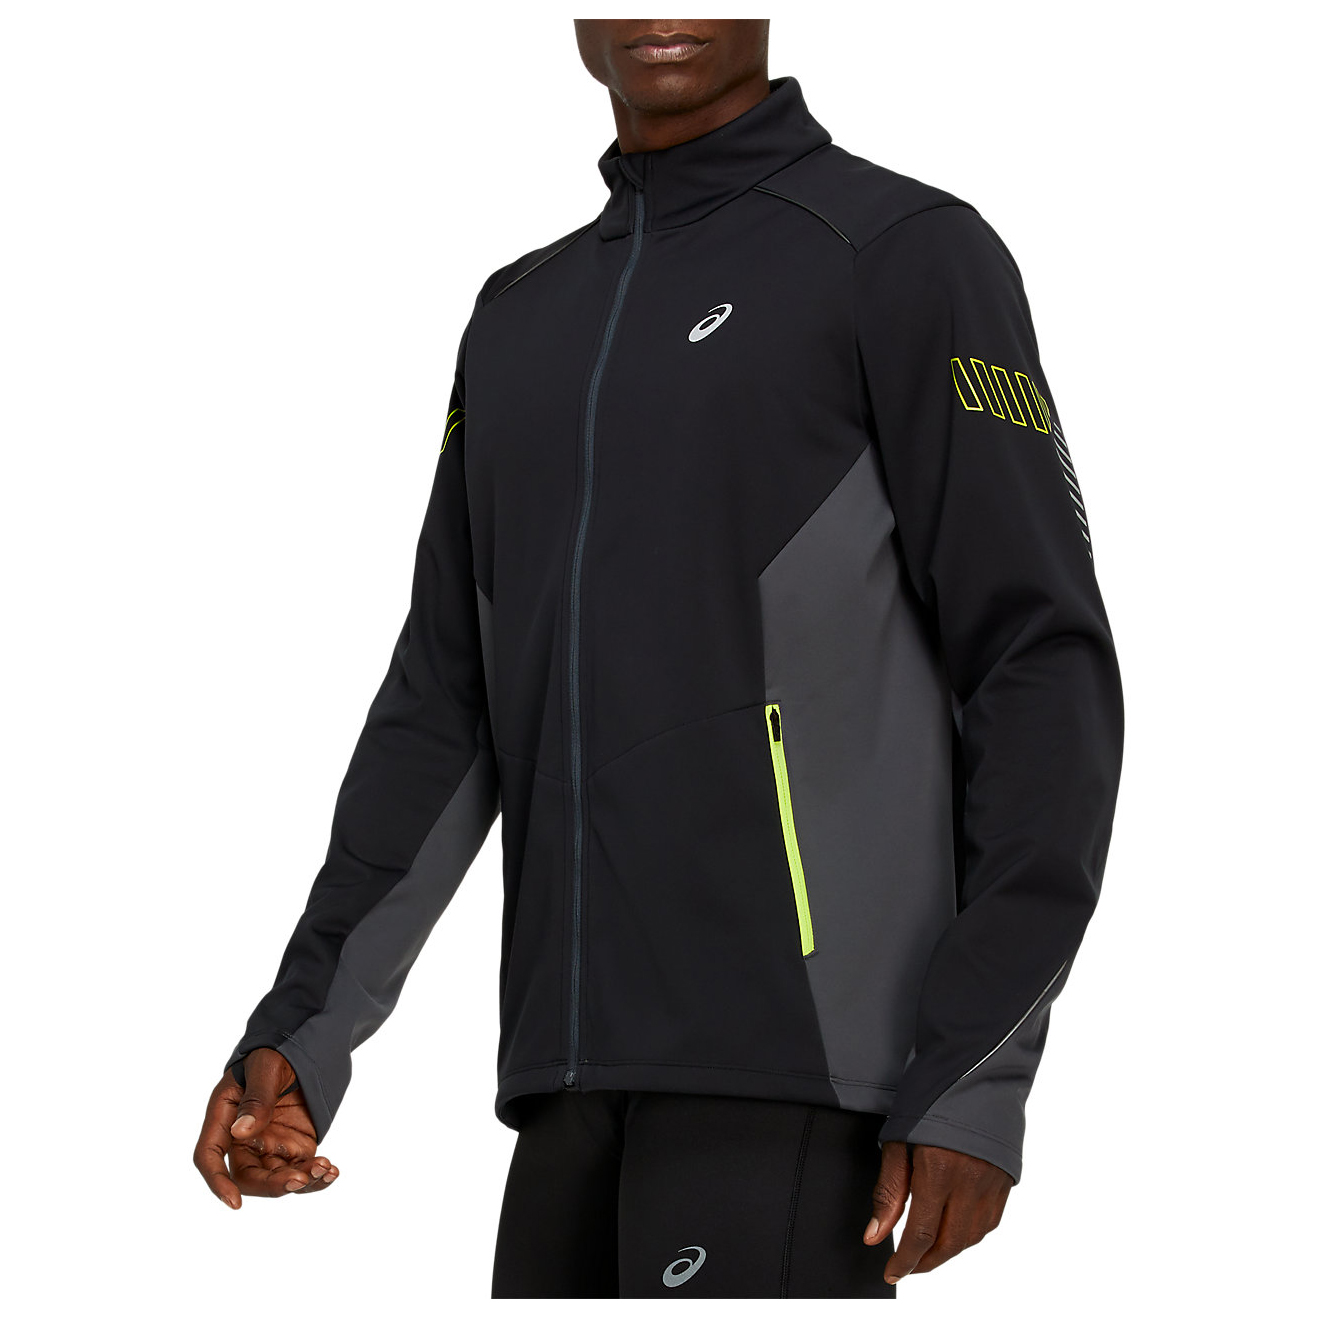 Asics Lite-Show Winter Jacket - Running jacket Men's   Buy online ...